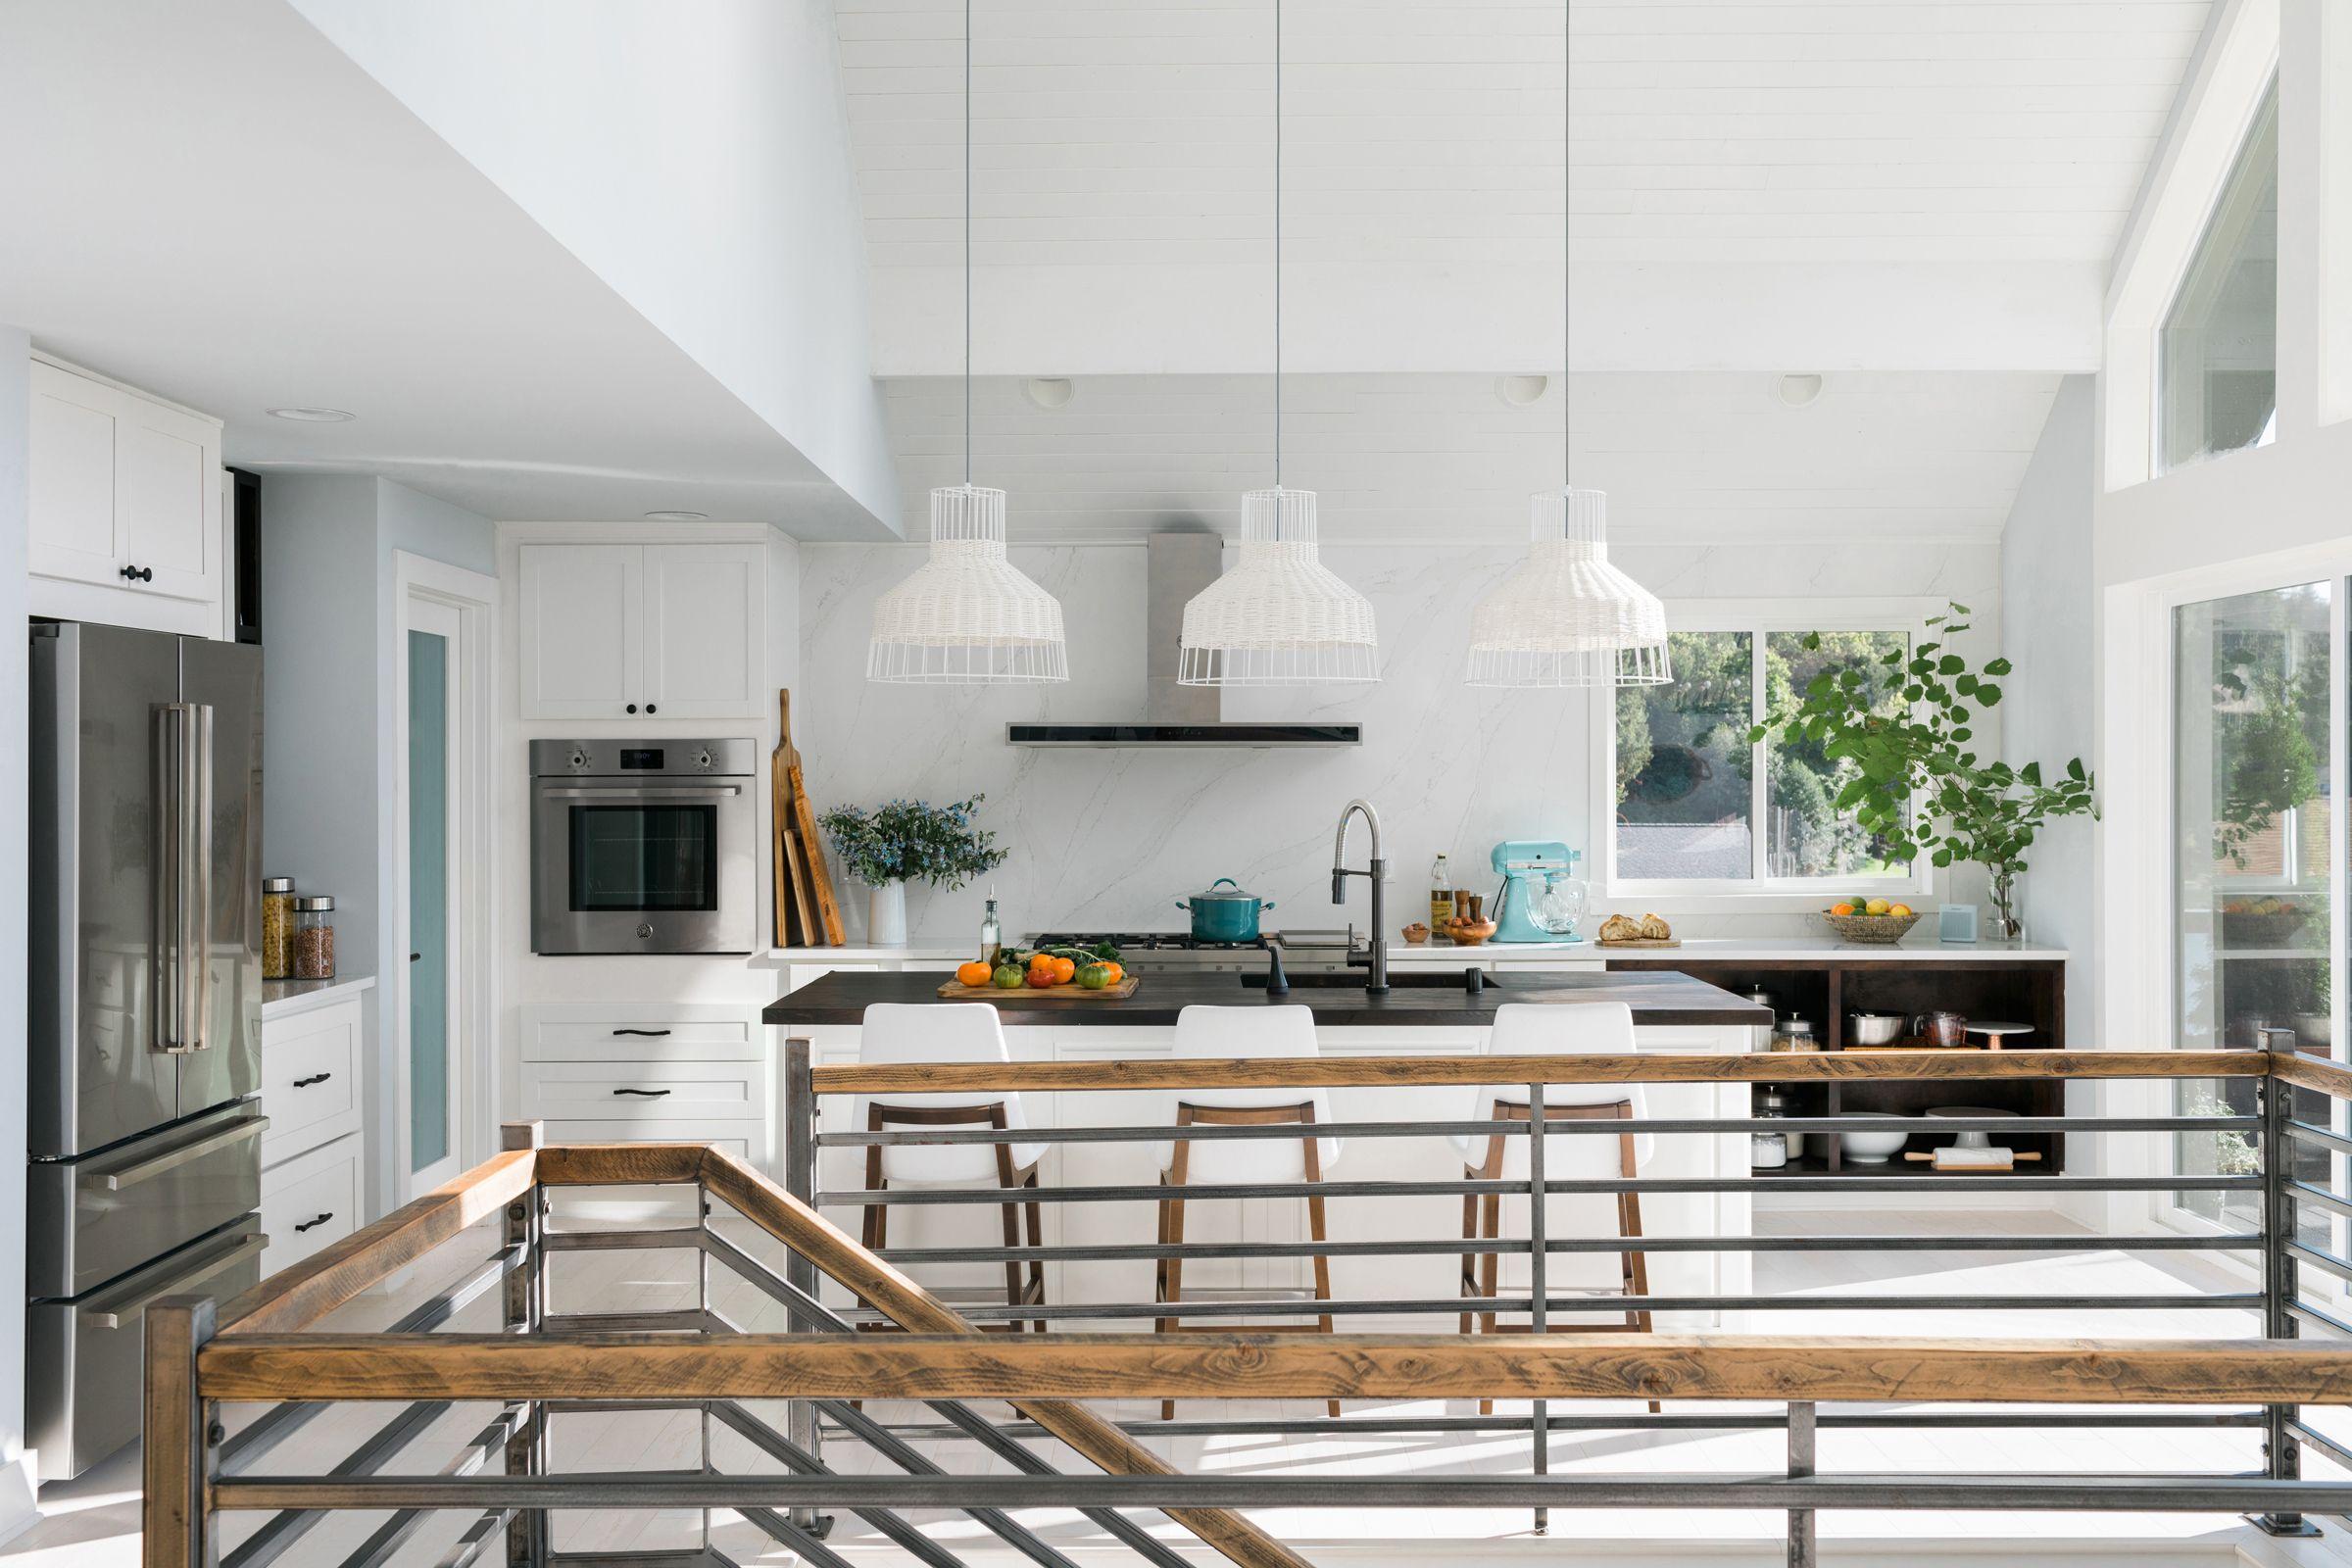 Hgtvdream home sweepstakes 2018